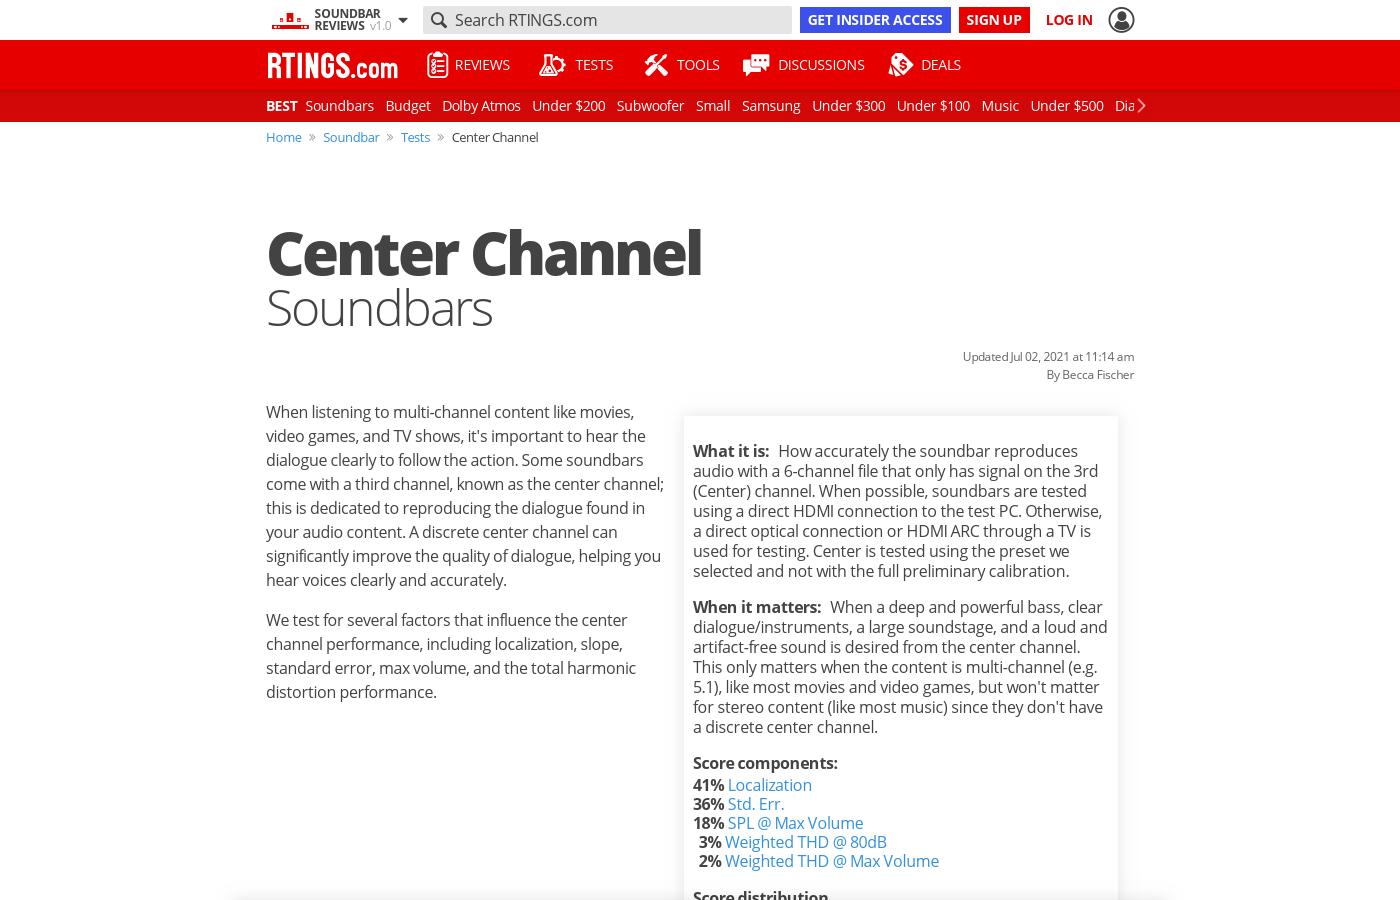 Center Channel: Soundbars